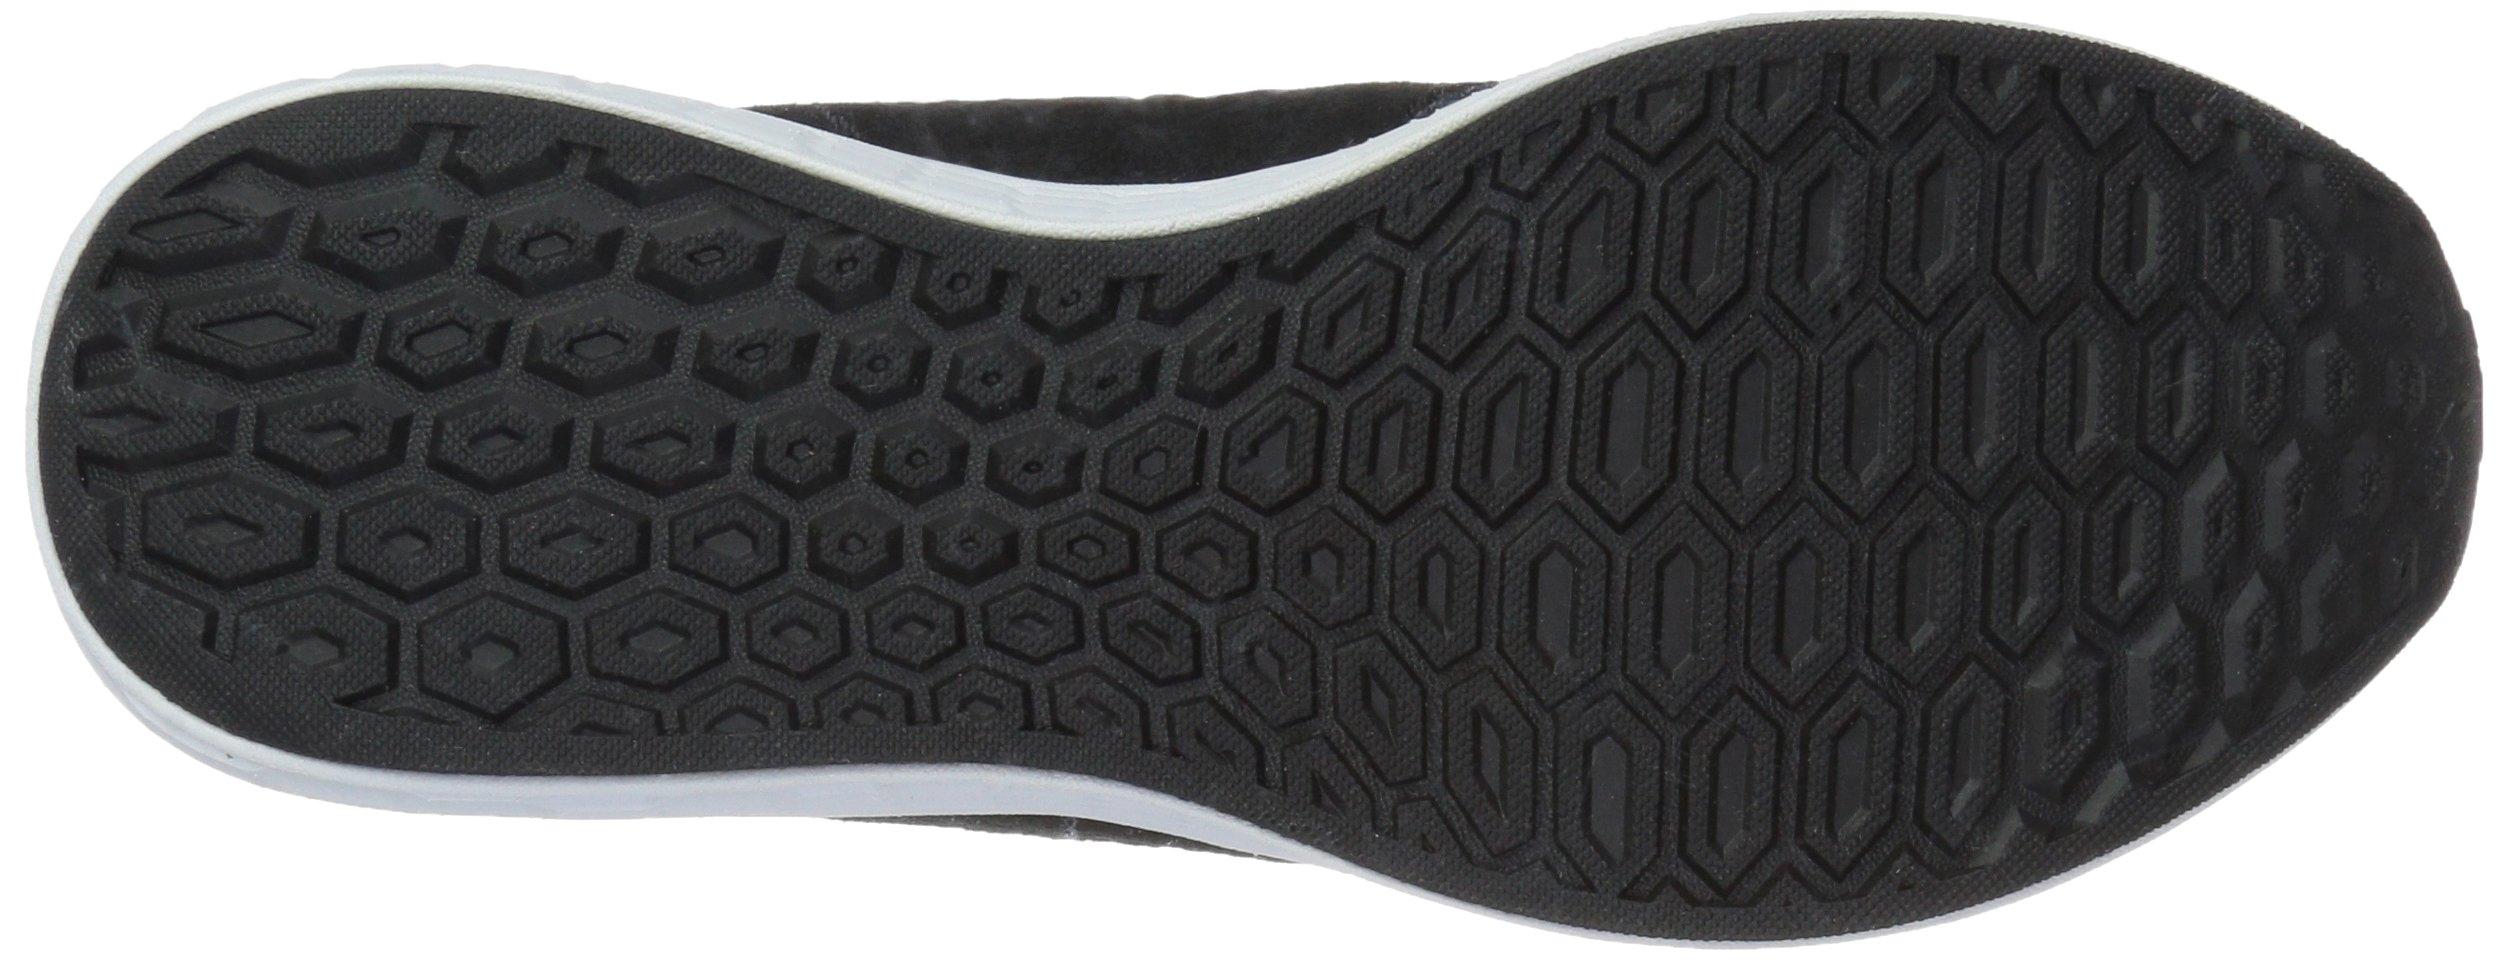 New Balance Men's Cruz V2 Fresh Foam Running Shoe, black/white, 7 D US by New Balance (Image #3)